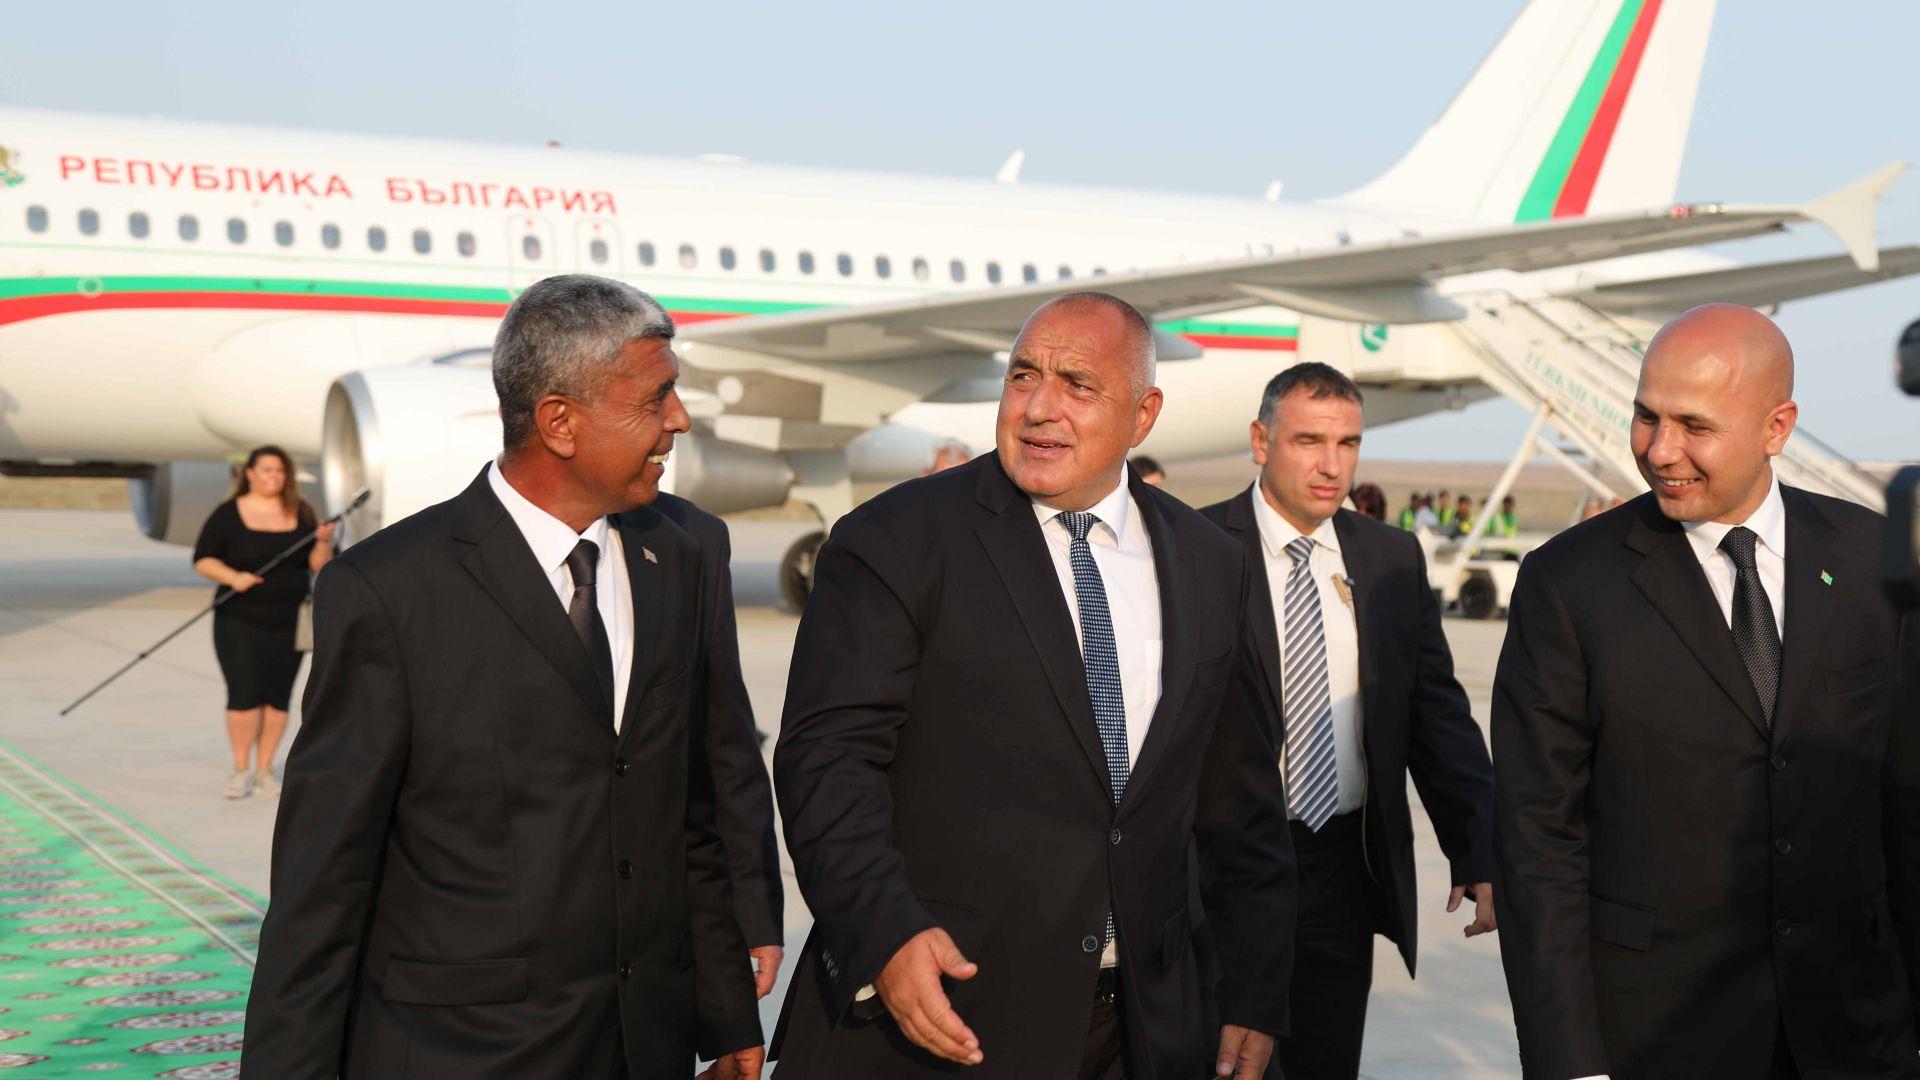 Борисов ще се срещне с Медведев на форум в Туркменистан